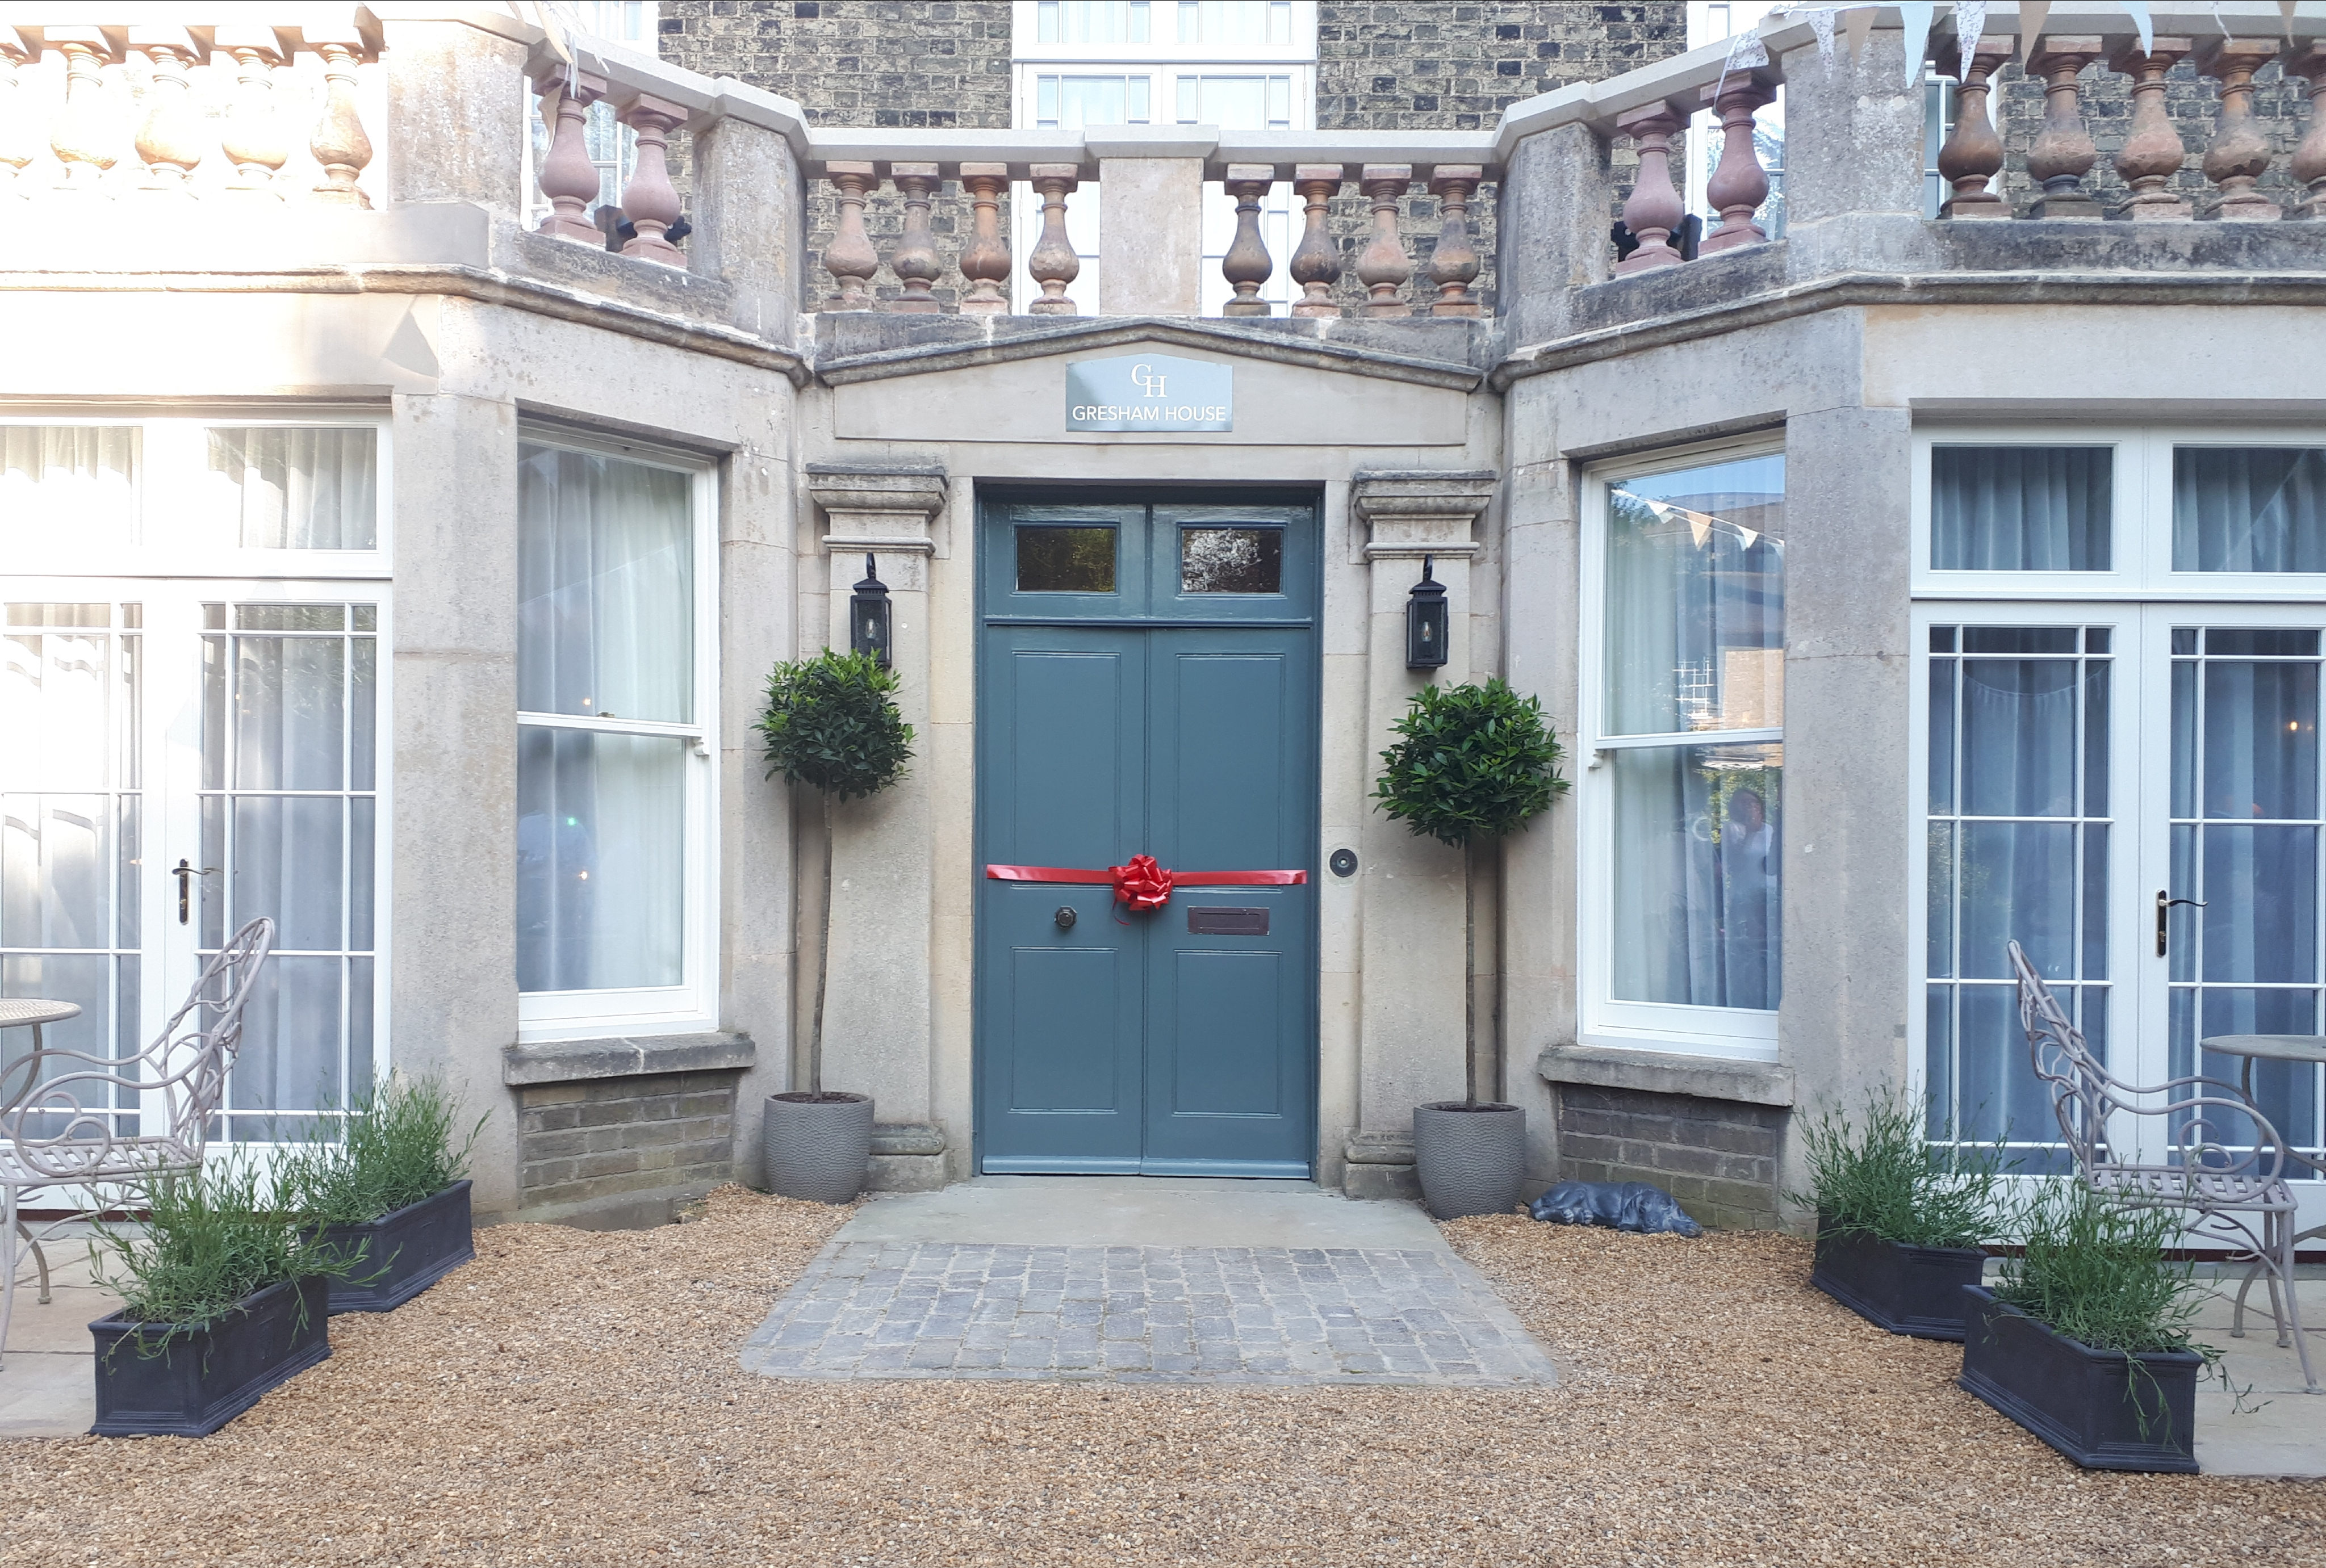 Gresham House Wellness Cambridge